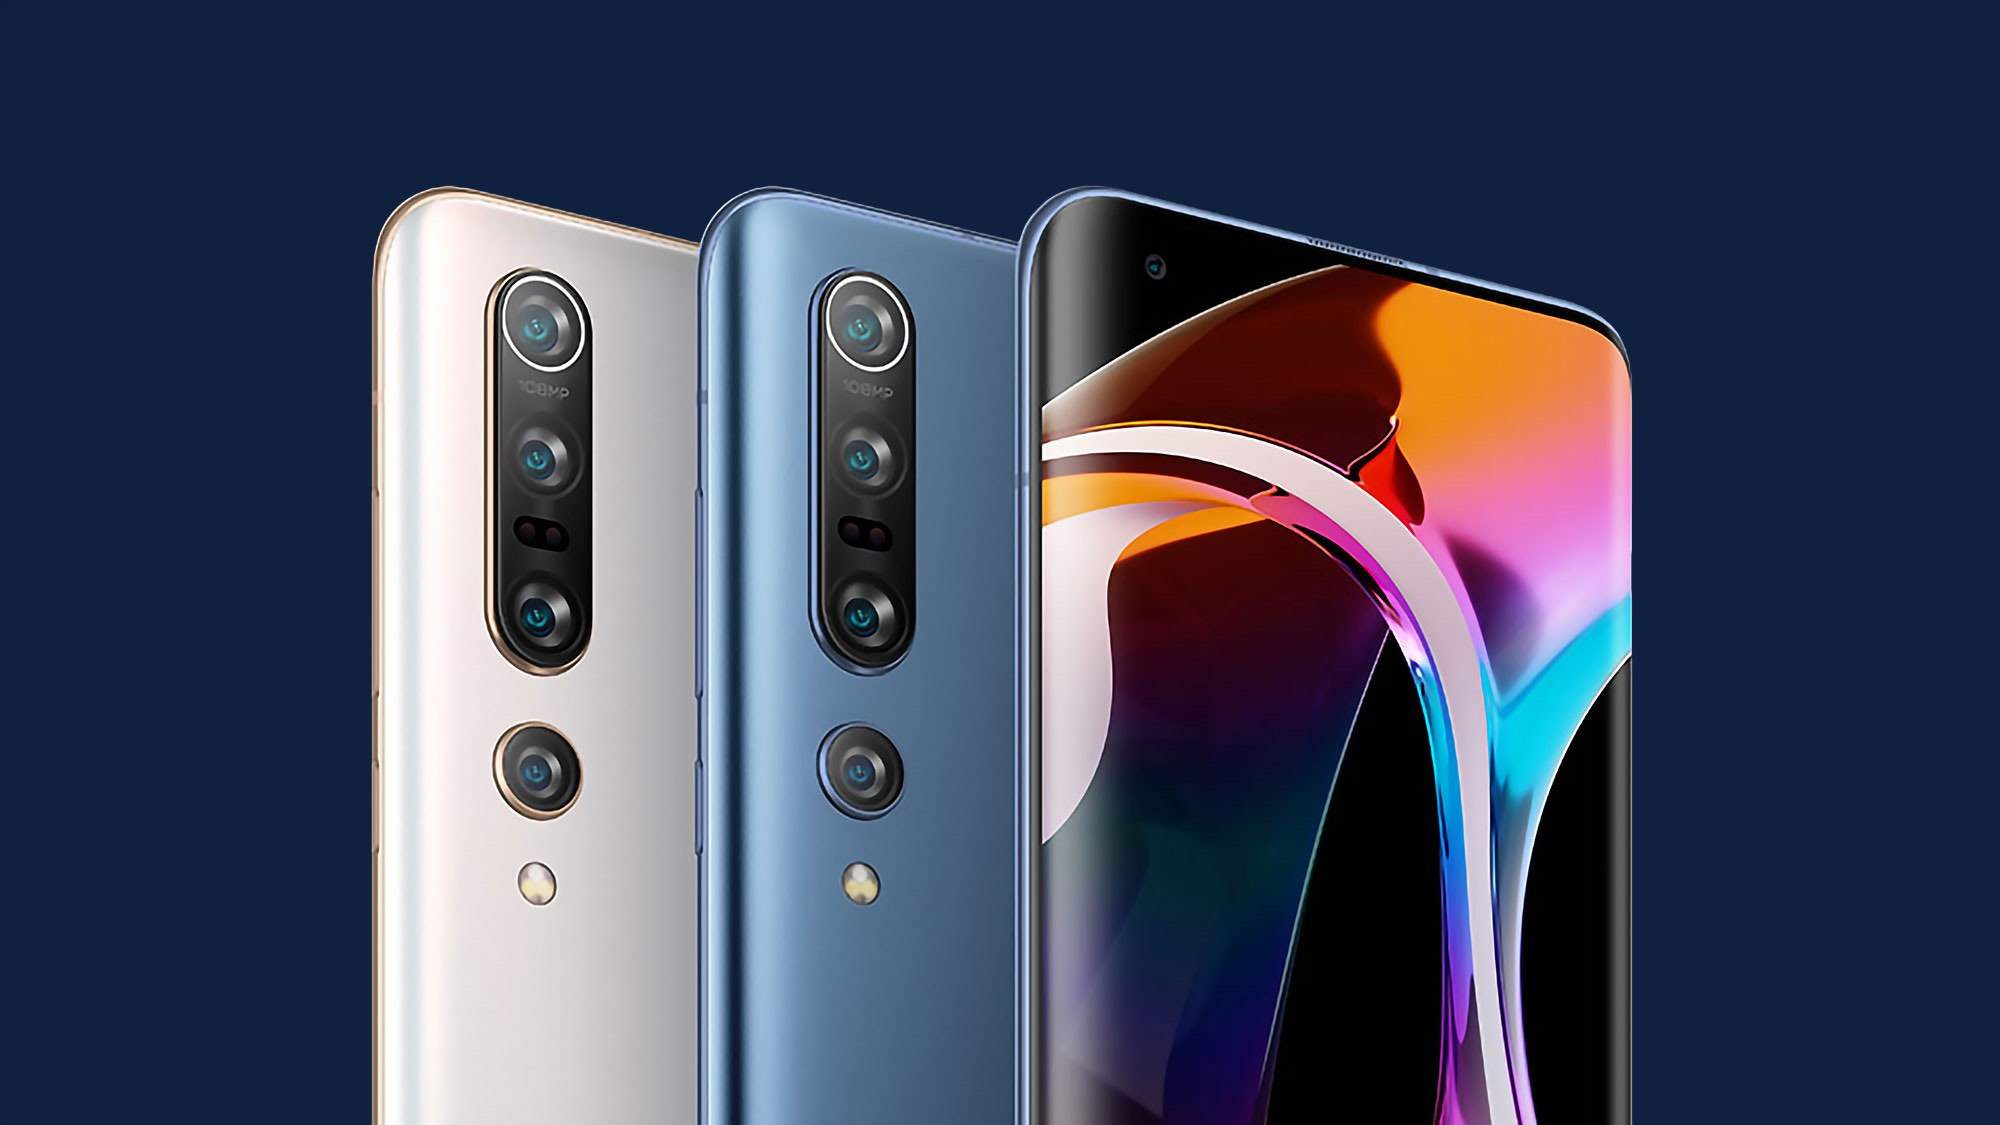 DXOMARK назвала Xiaomi Mi 10 Pro лучшим смартфоном по качеству фото и видео